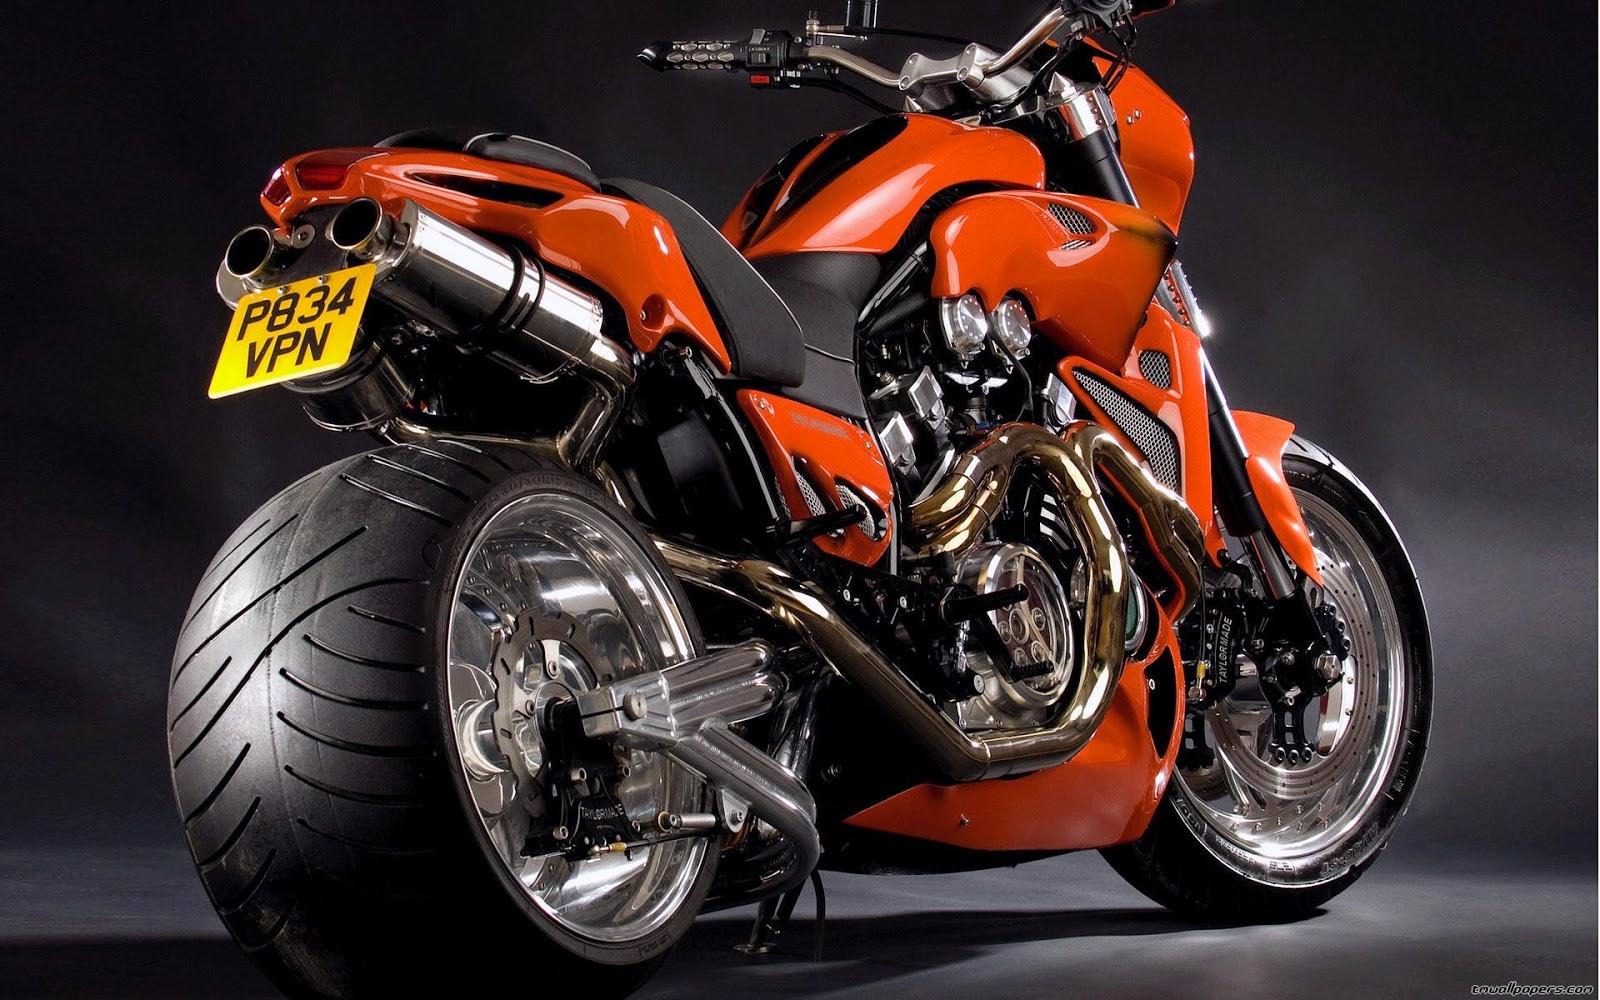 Top Wallpaper High Resolution Harley Davidson - motorcycles-red-harley-davidson-motorcycles-high-resolution-wallpaper-hd-widescreen-power-wheels-red-harley-davidson-motorcycle-red-harley-davidson-motorcycle-red-deer-harley-davidson-m  Trends_778185.jpg